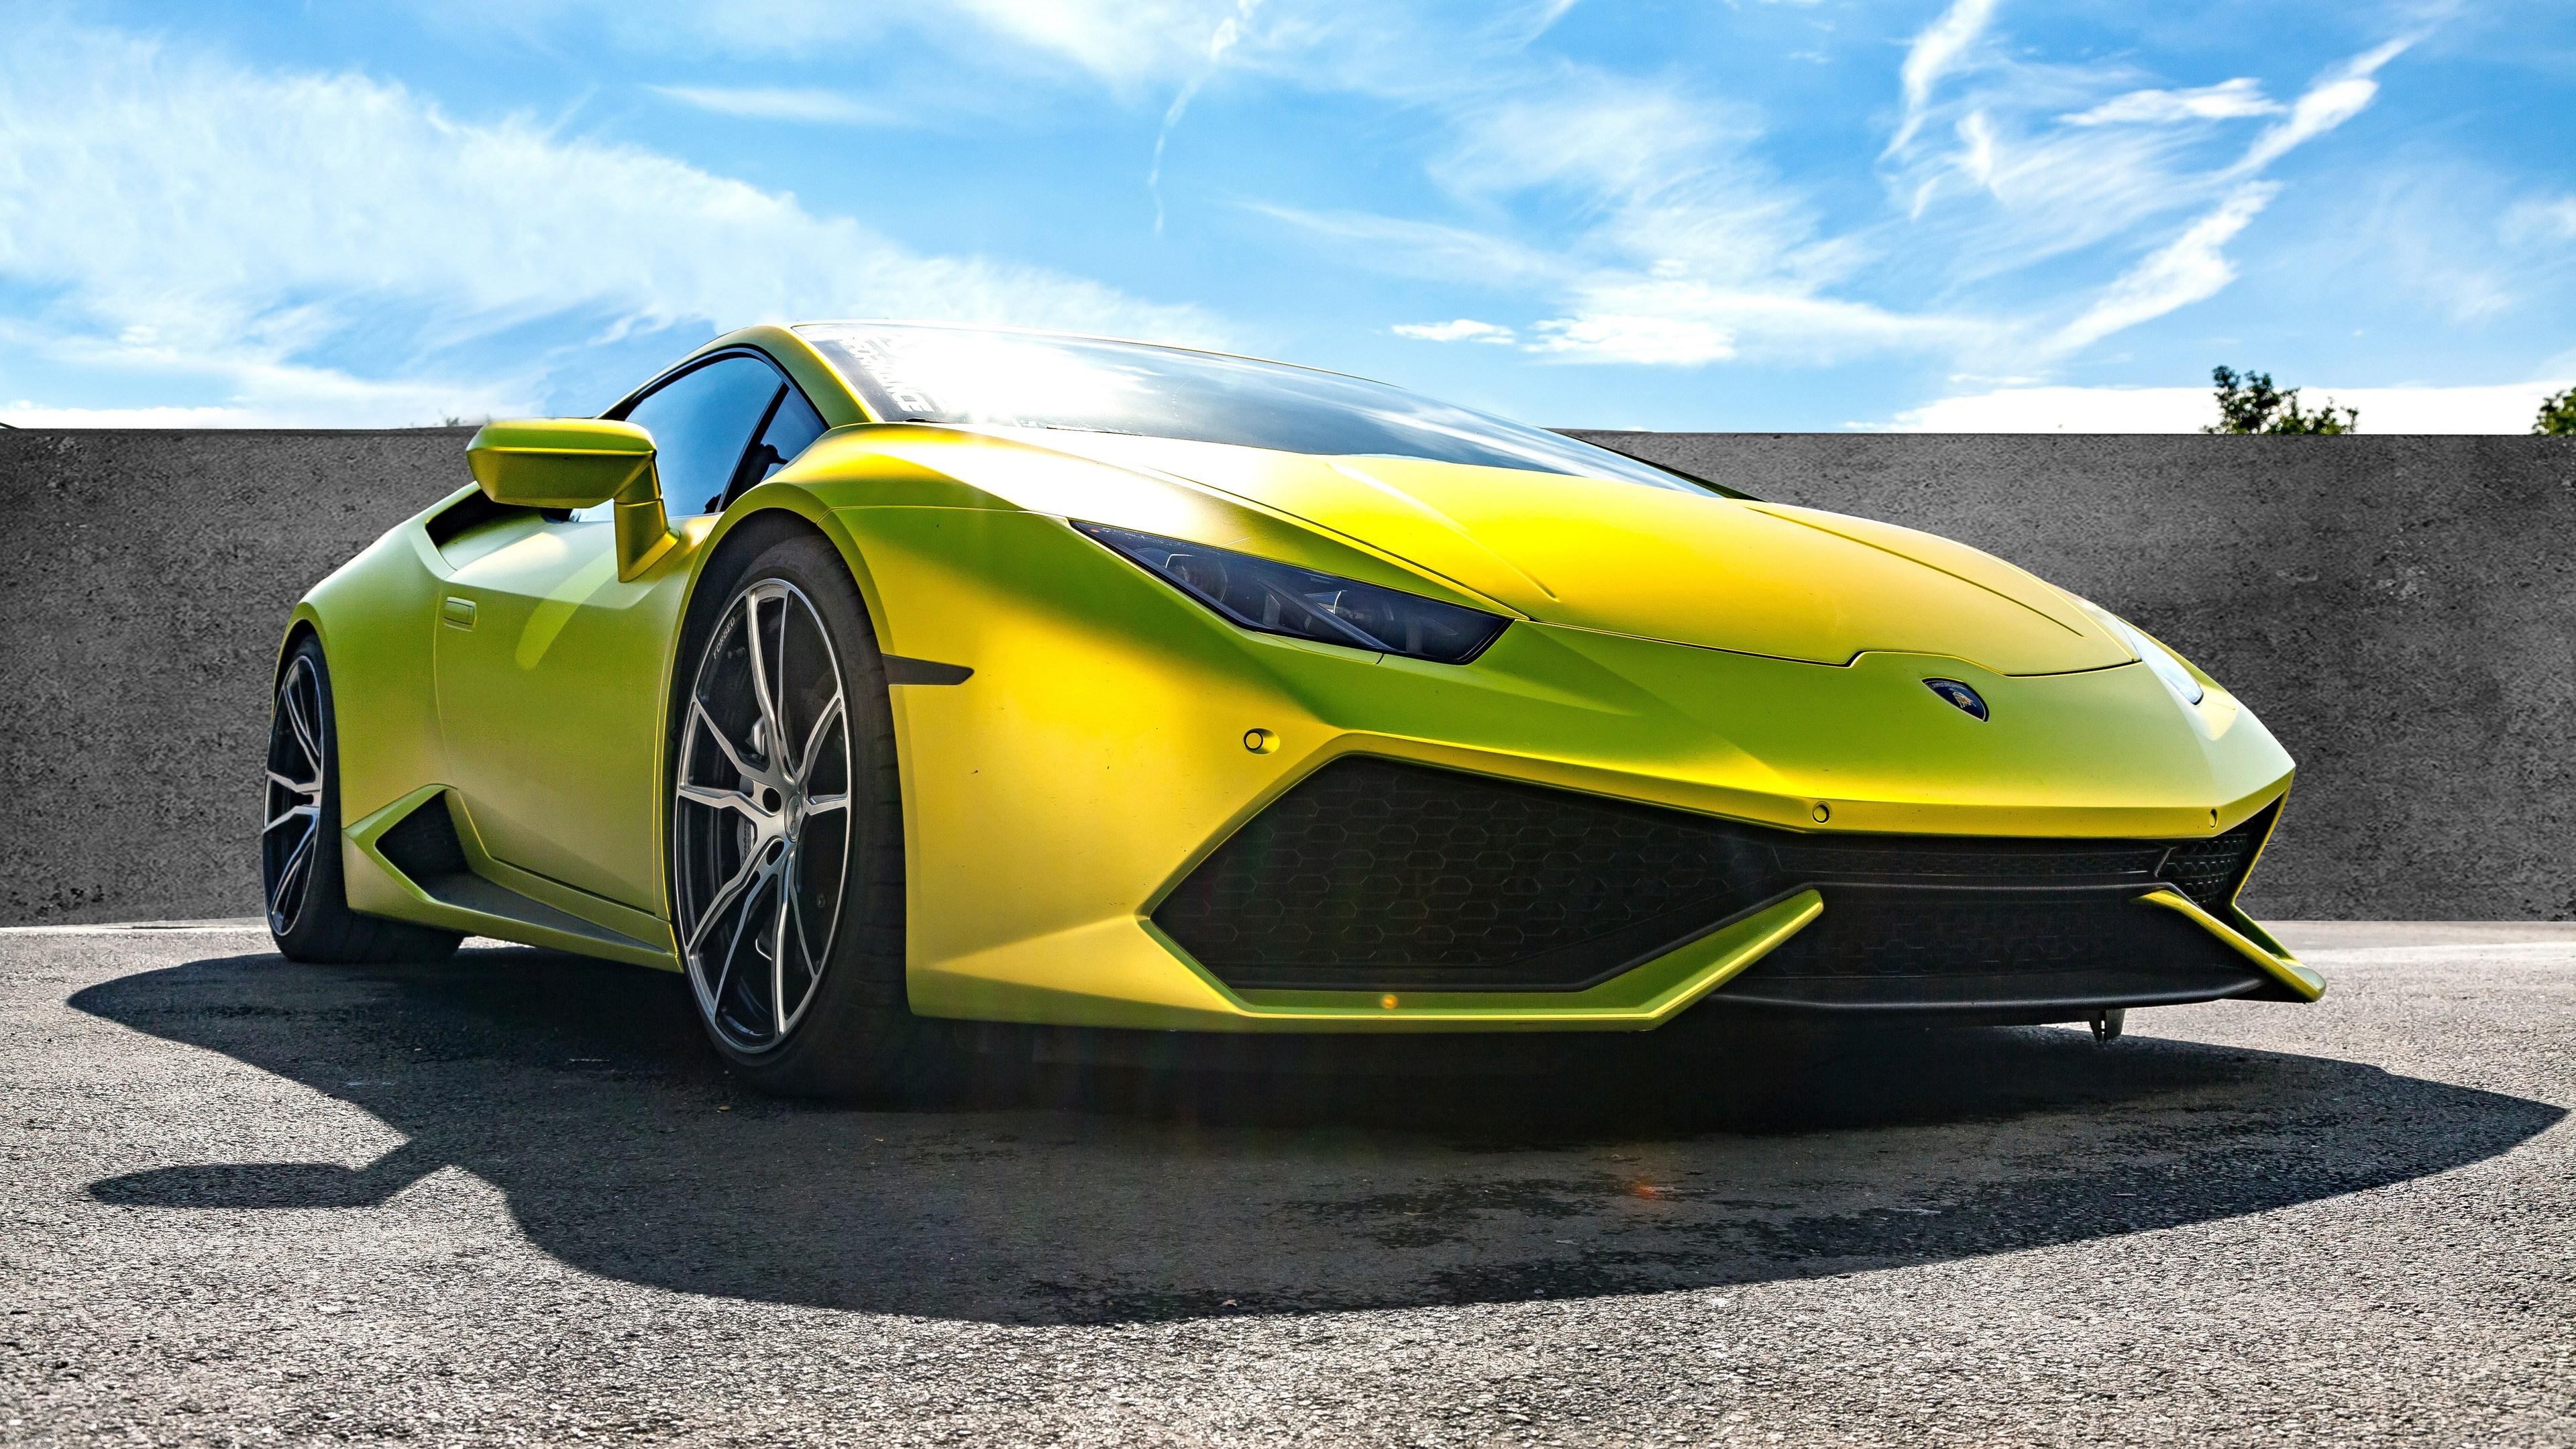 4k lamborghini huracan 1546361643 - 4k Lamborghini Huracan - lamborghini wallpapers, lamborghini huracan wallpapers, hd-wallpapers, cars wallpapers, 5k wallpapers, 4k-wallpapers